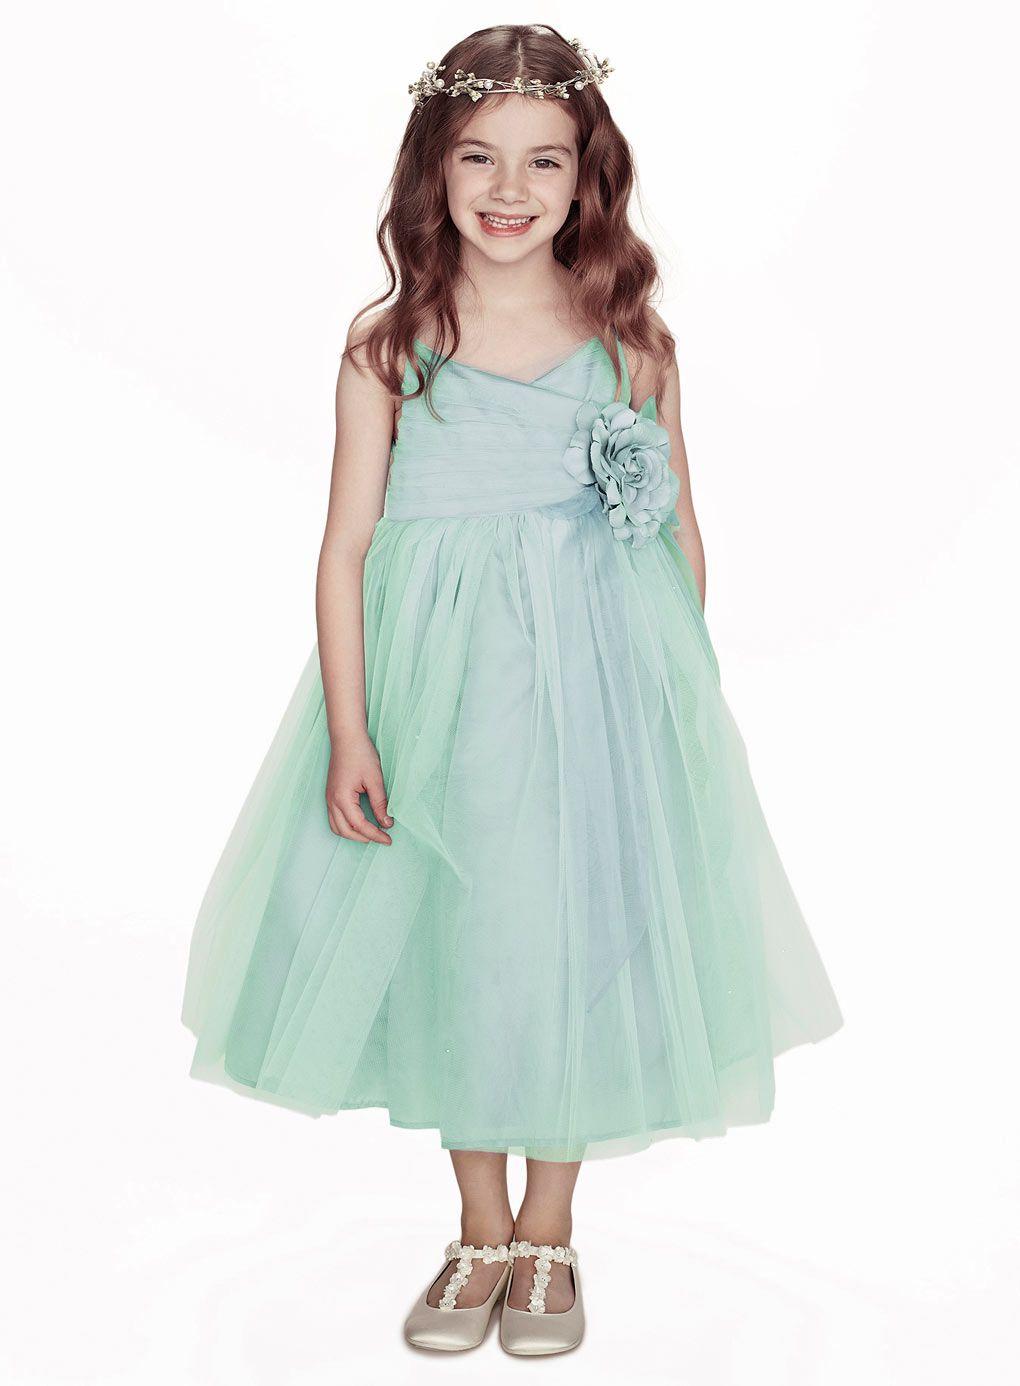 28 Adorable Children Dresses For Your Cute Flower Girls | Tulle ...